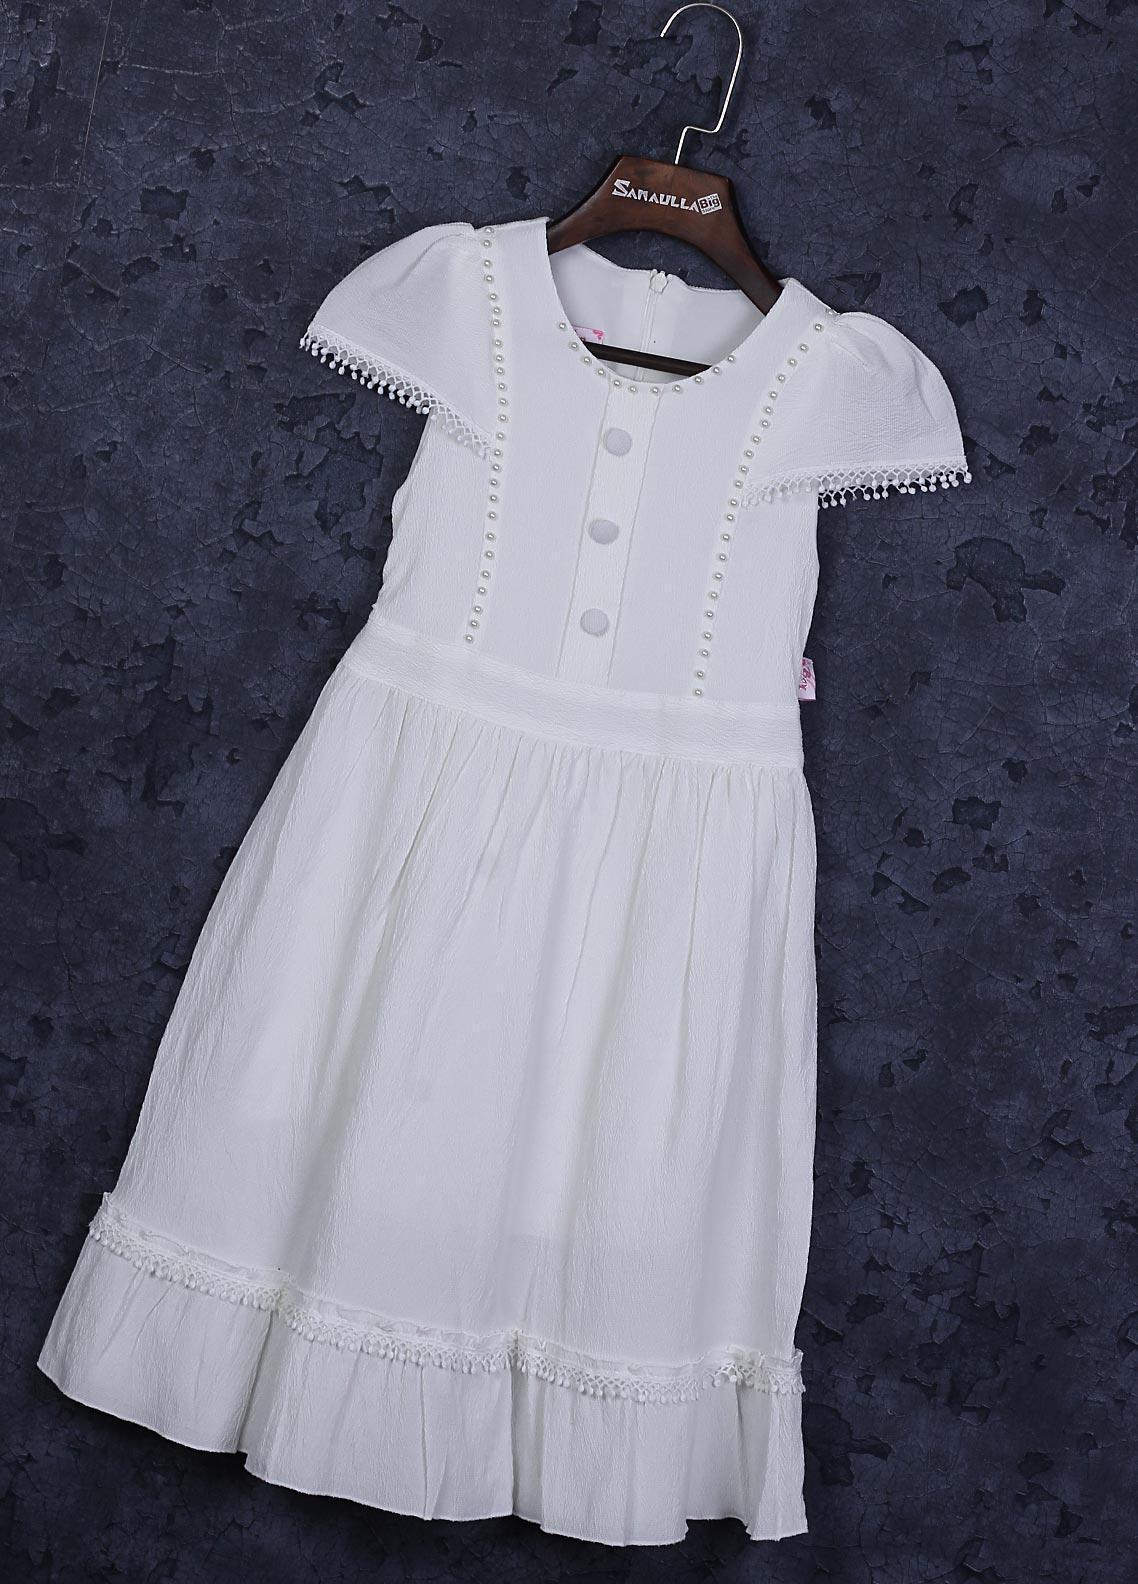 Sanaulla Exclusive Range Cotton Fancy Girls Frocks -  22665-1 White